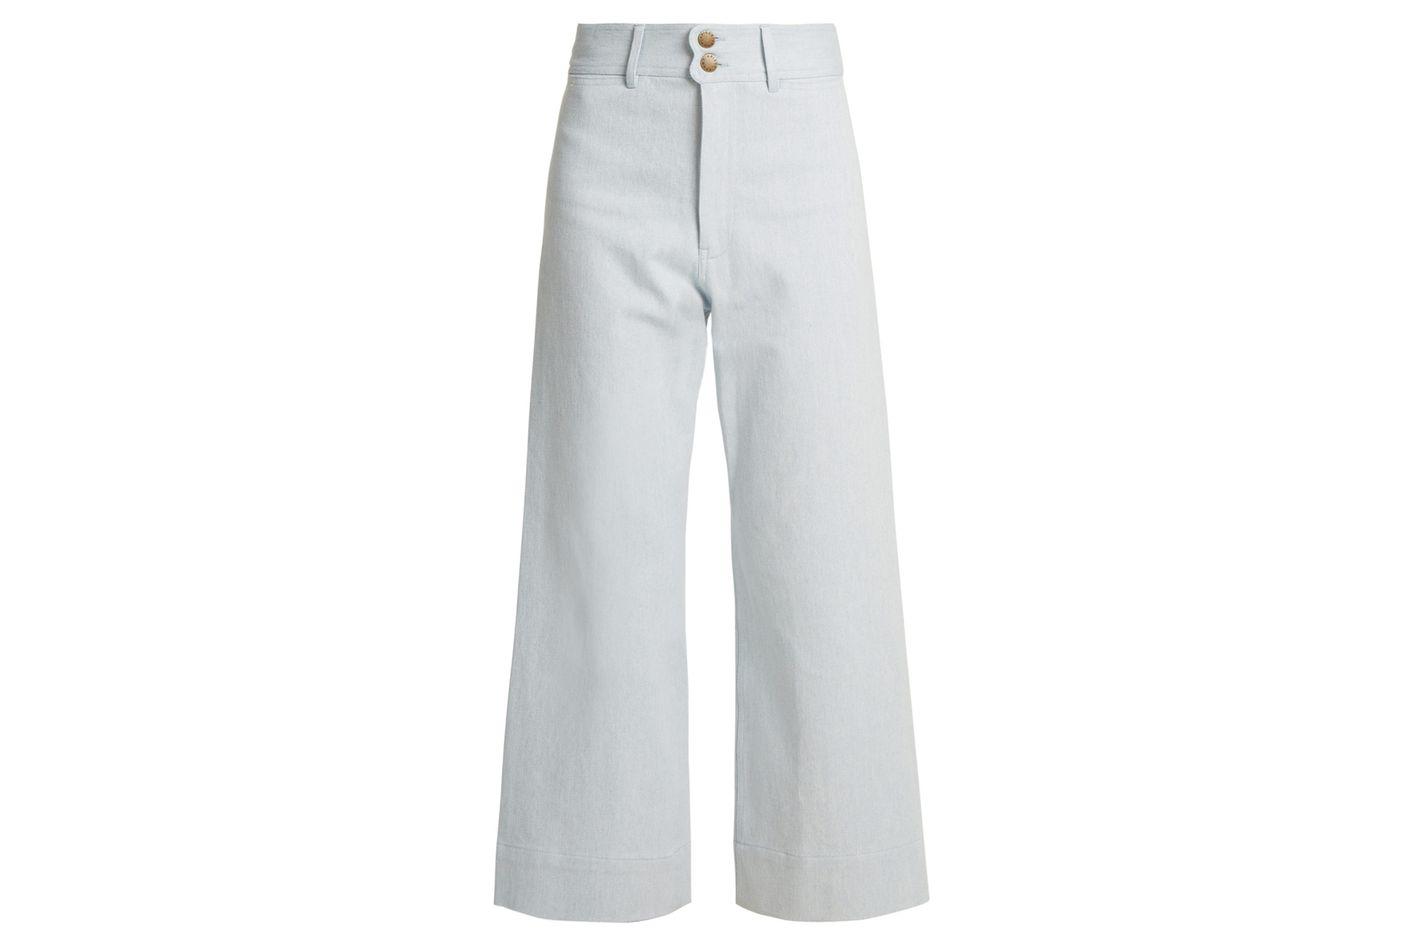 Apiece Apart Merida High-Waist Jeans